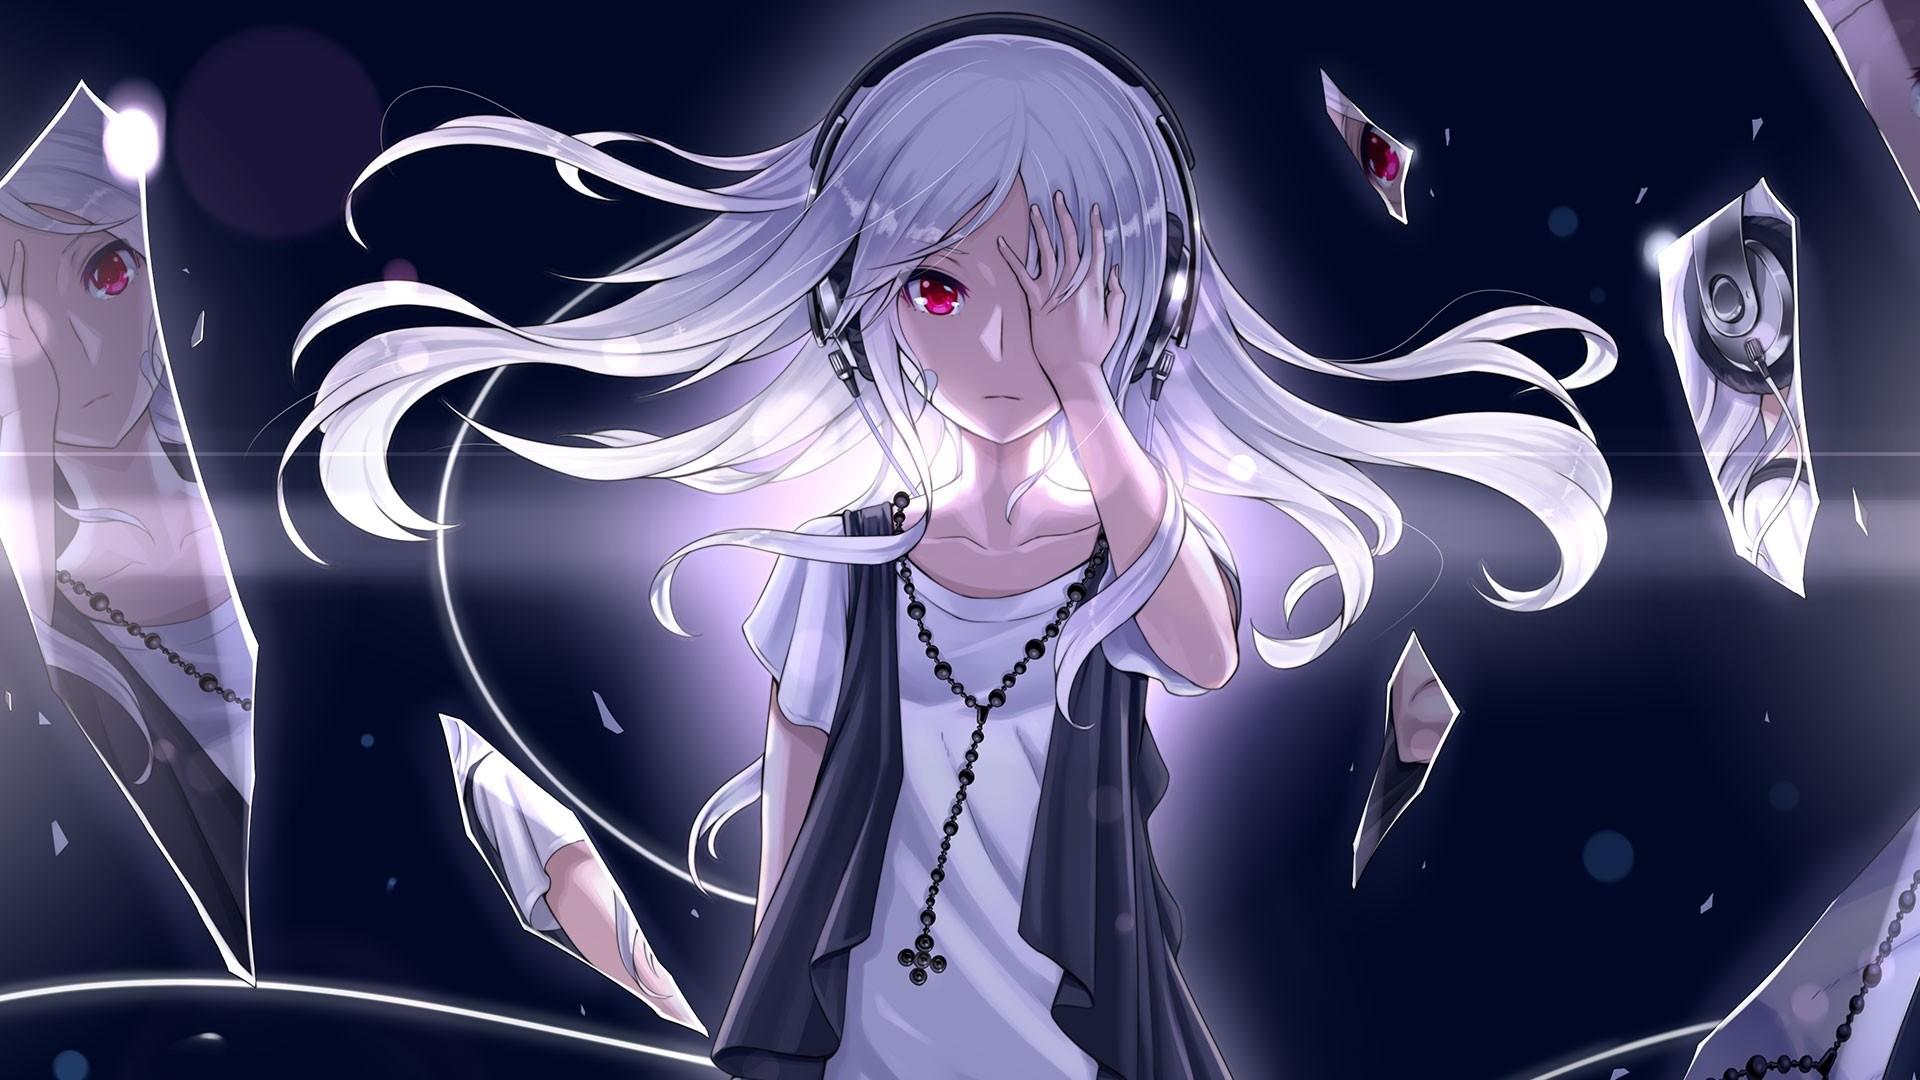 nightcore anime girl